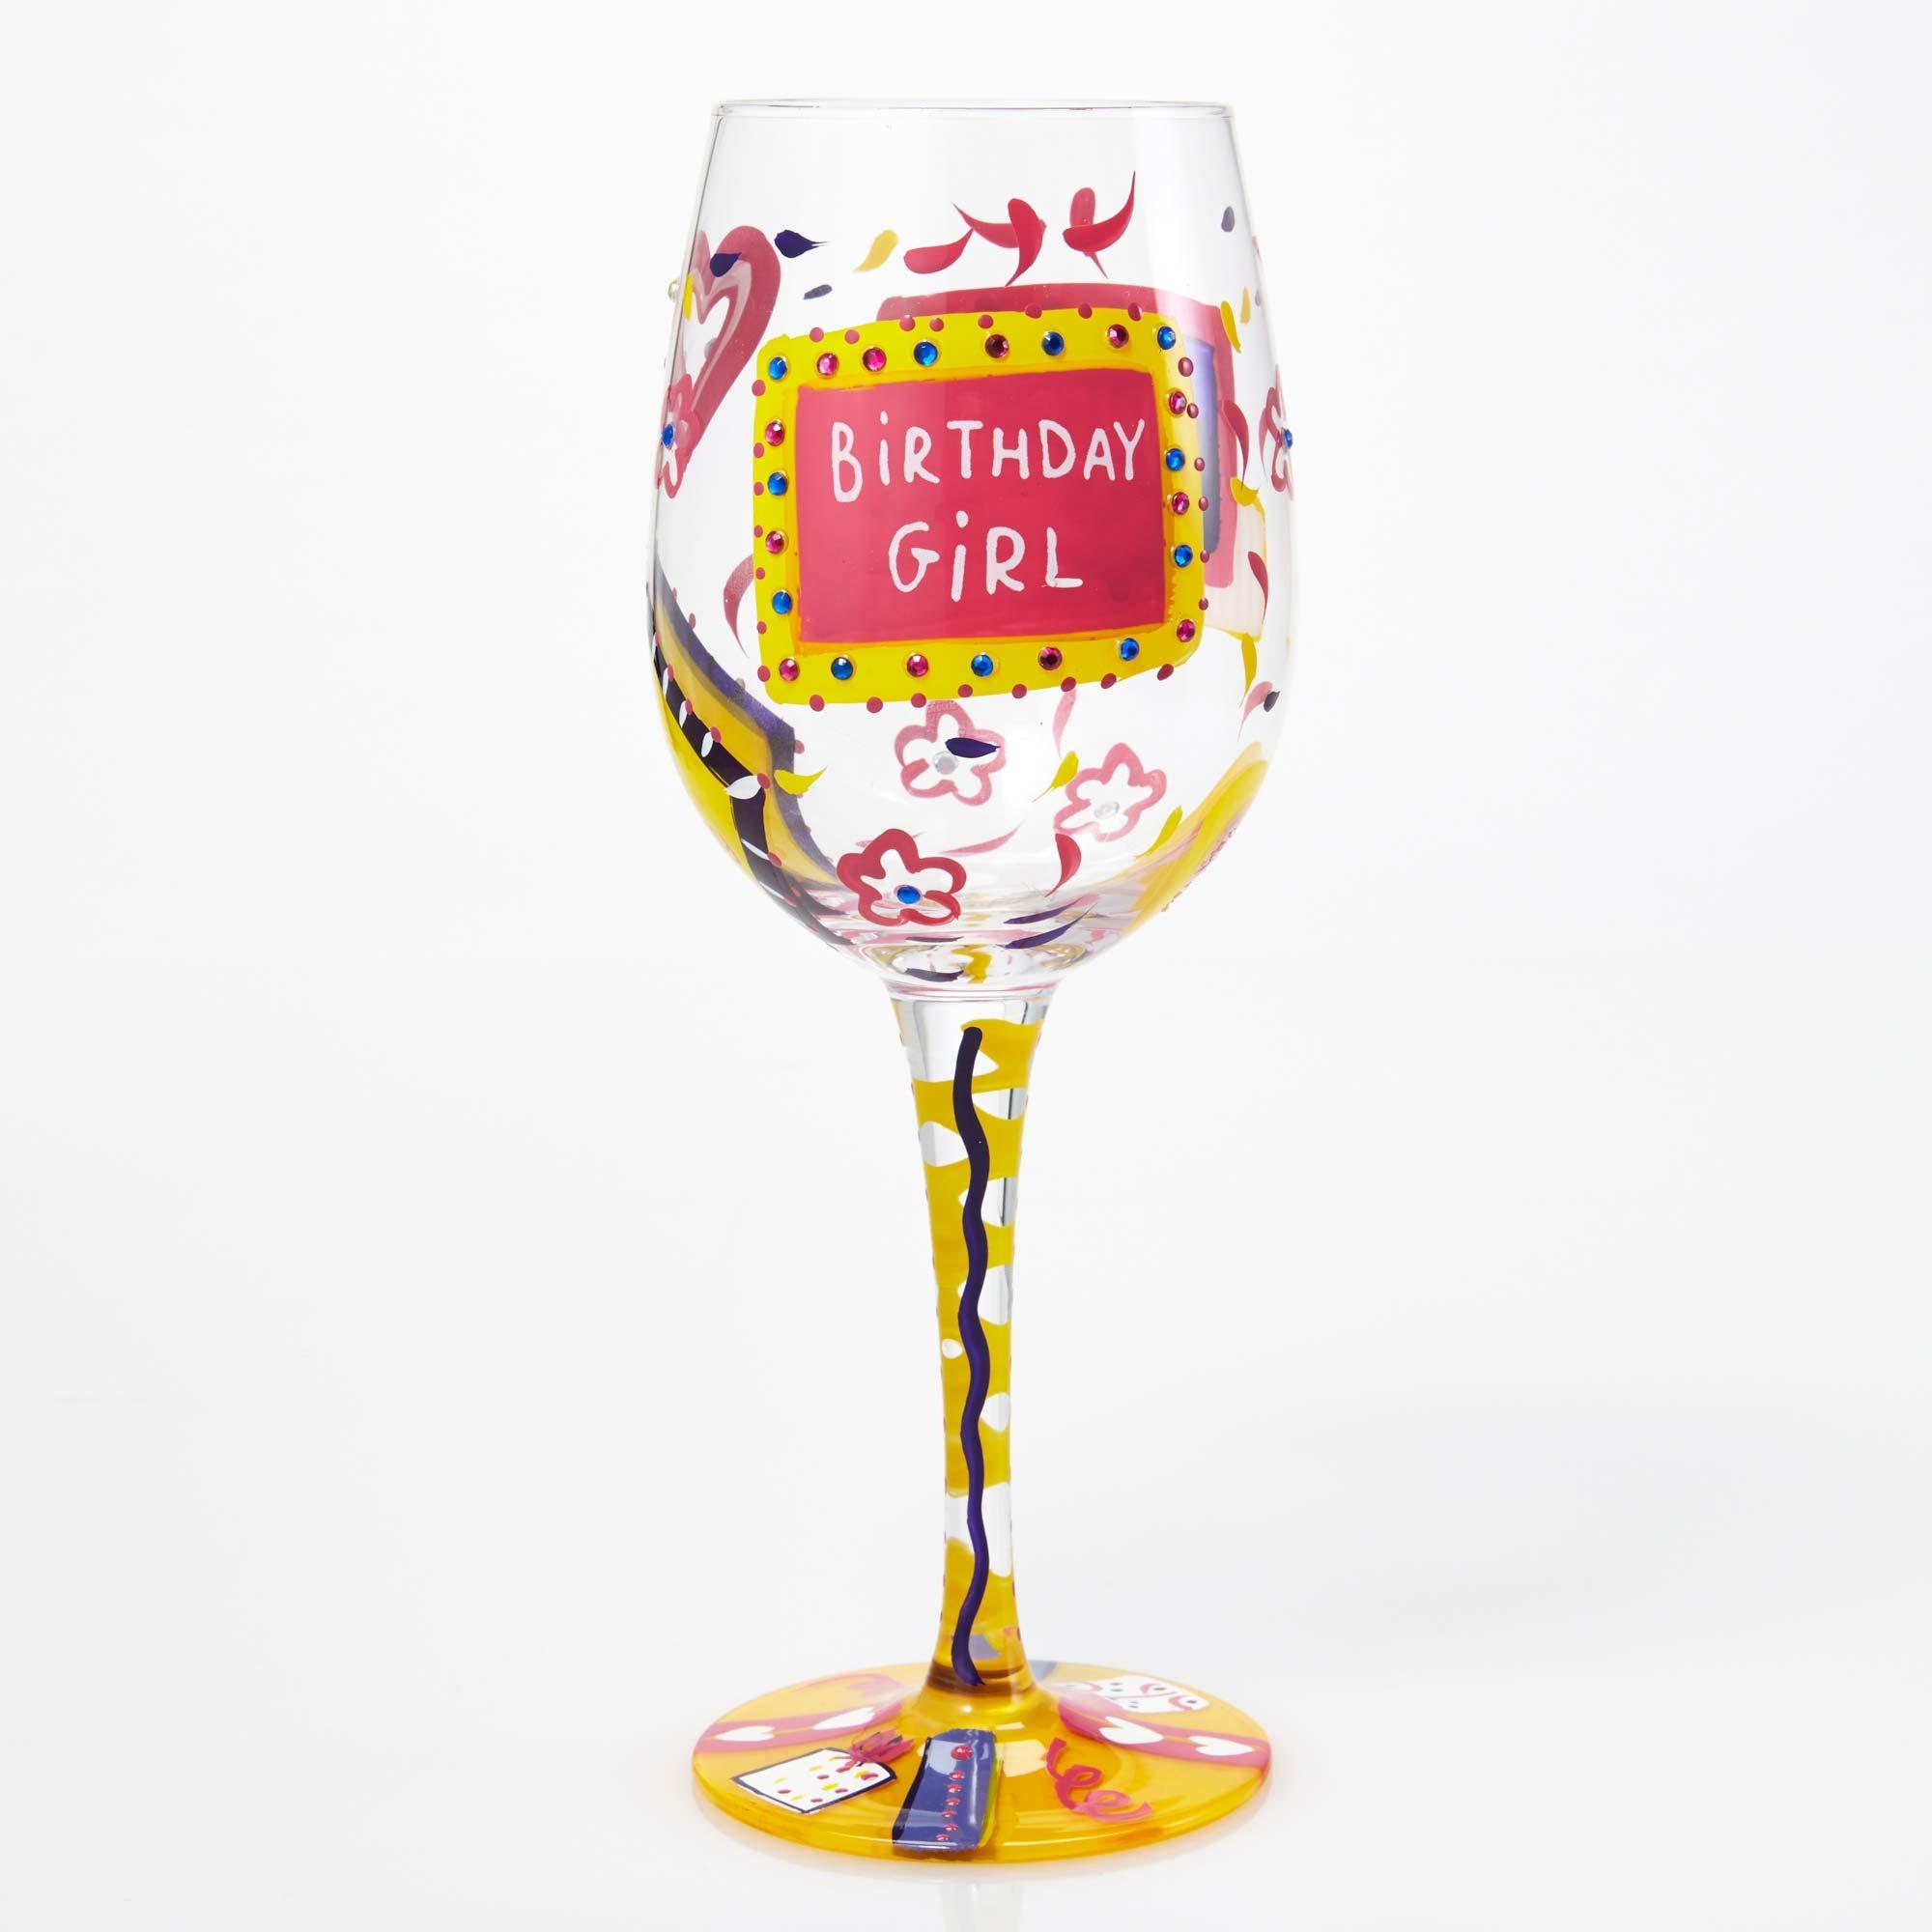 Birthday Girl - Wine Glass